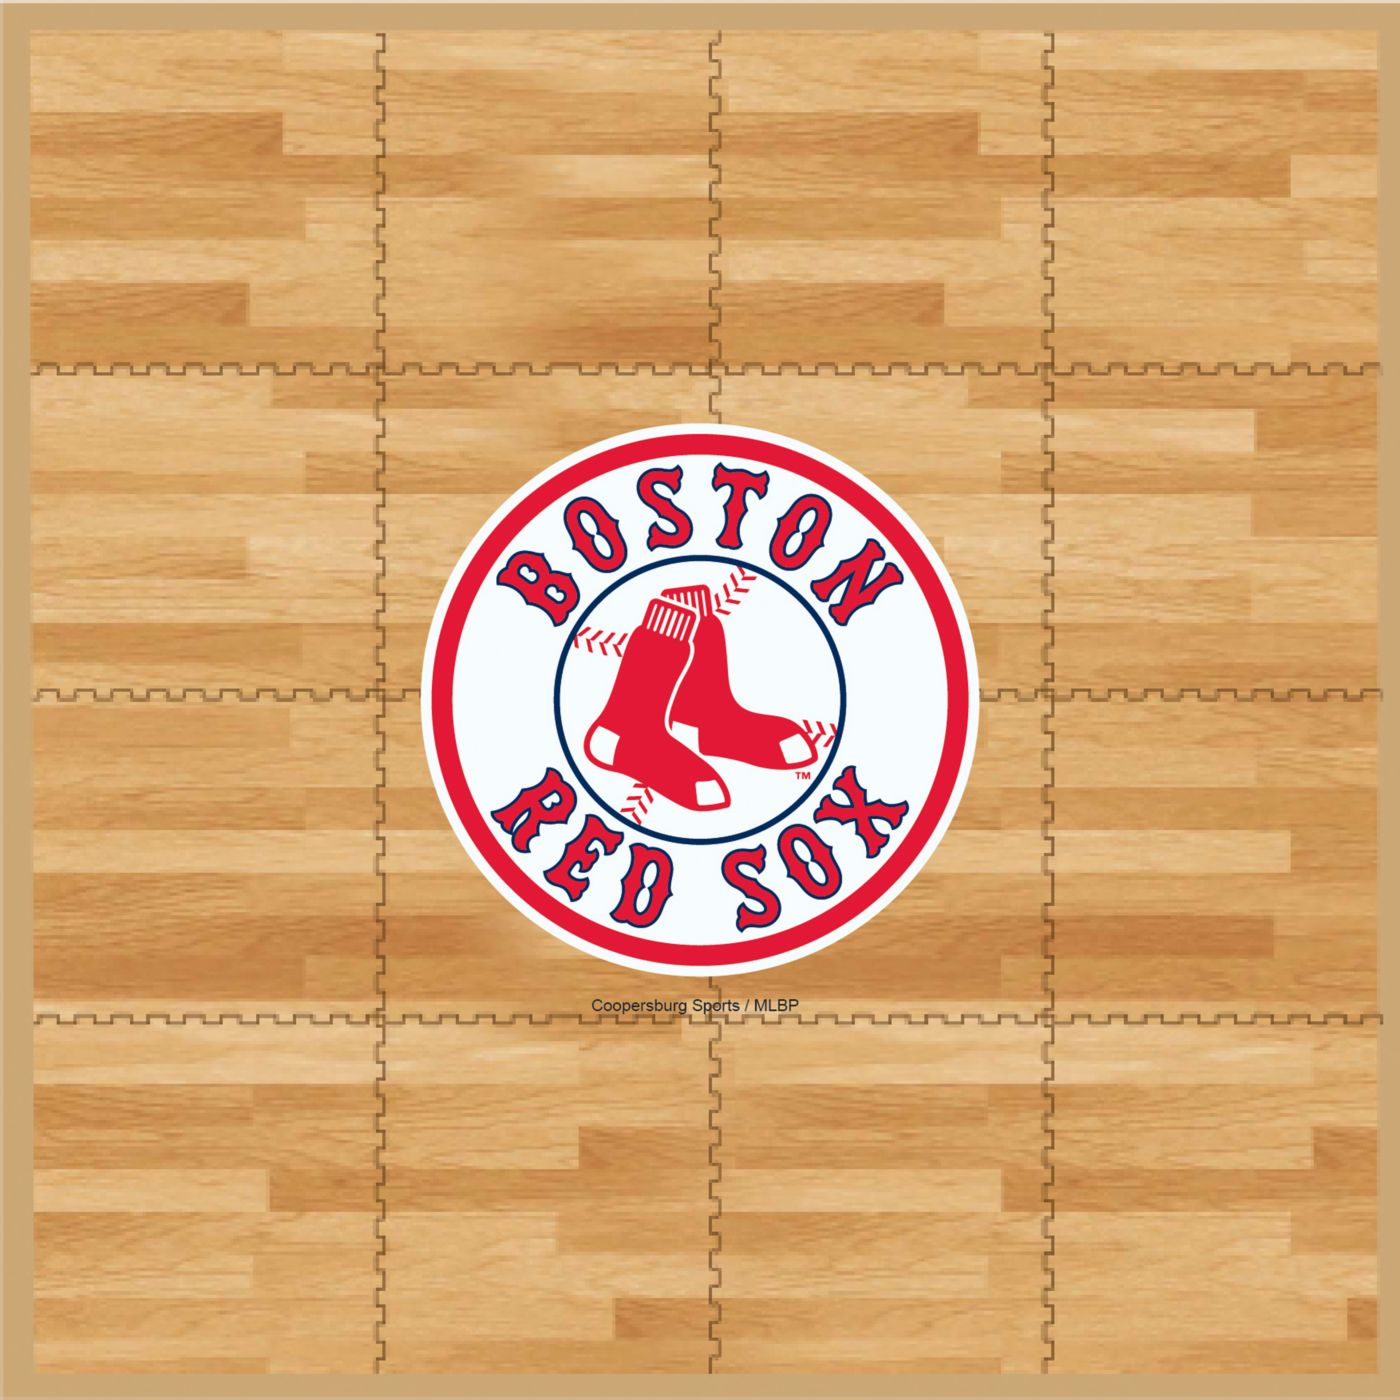 Coopersburg Sports Boston Red Sox Fan Floor